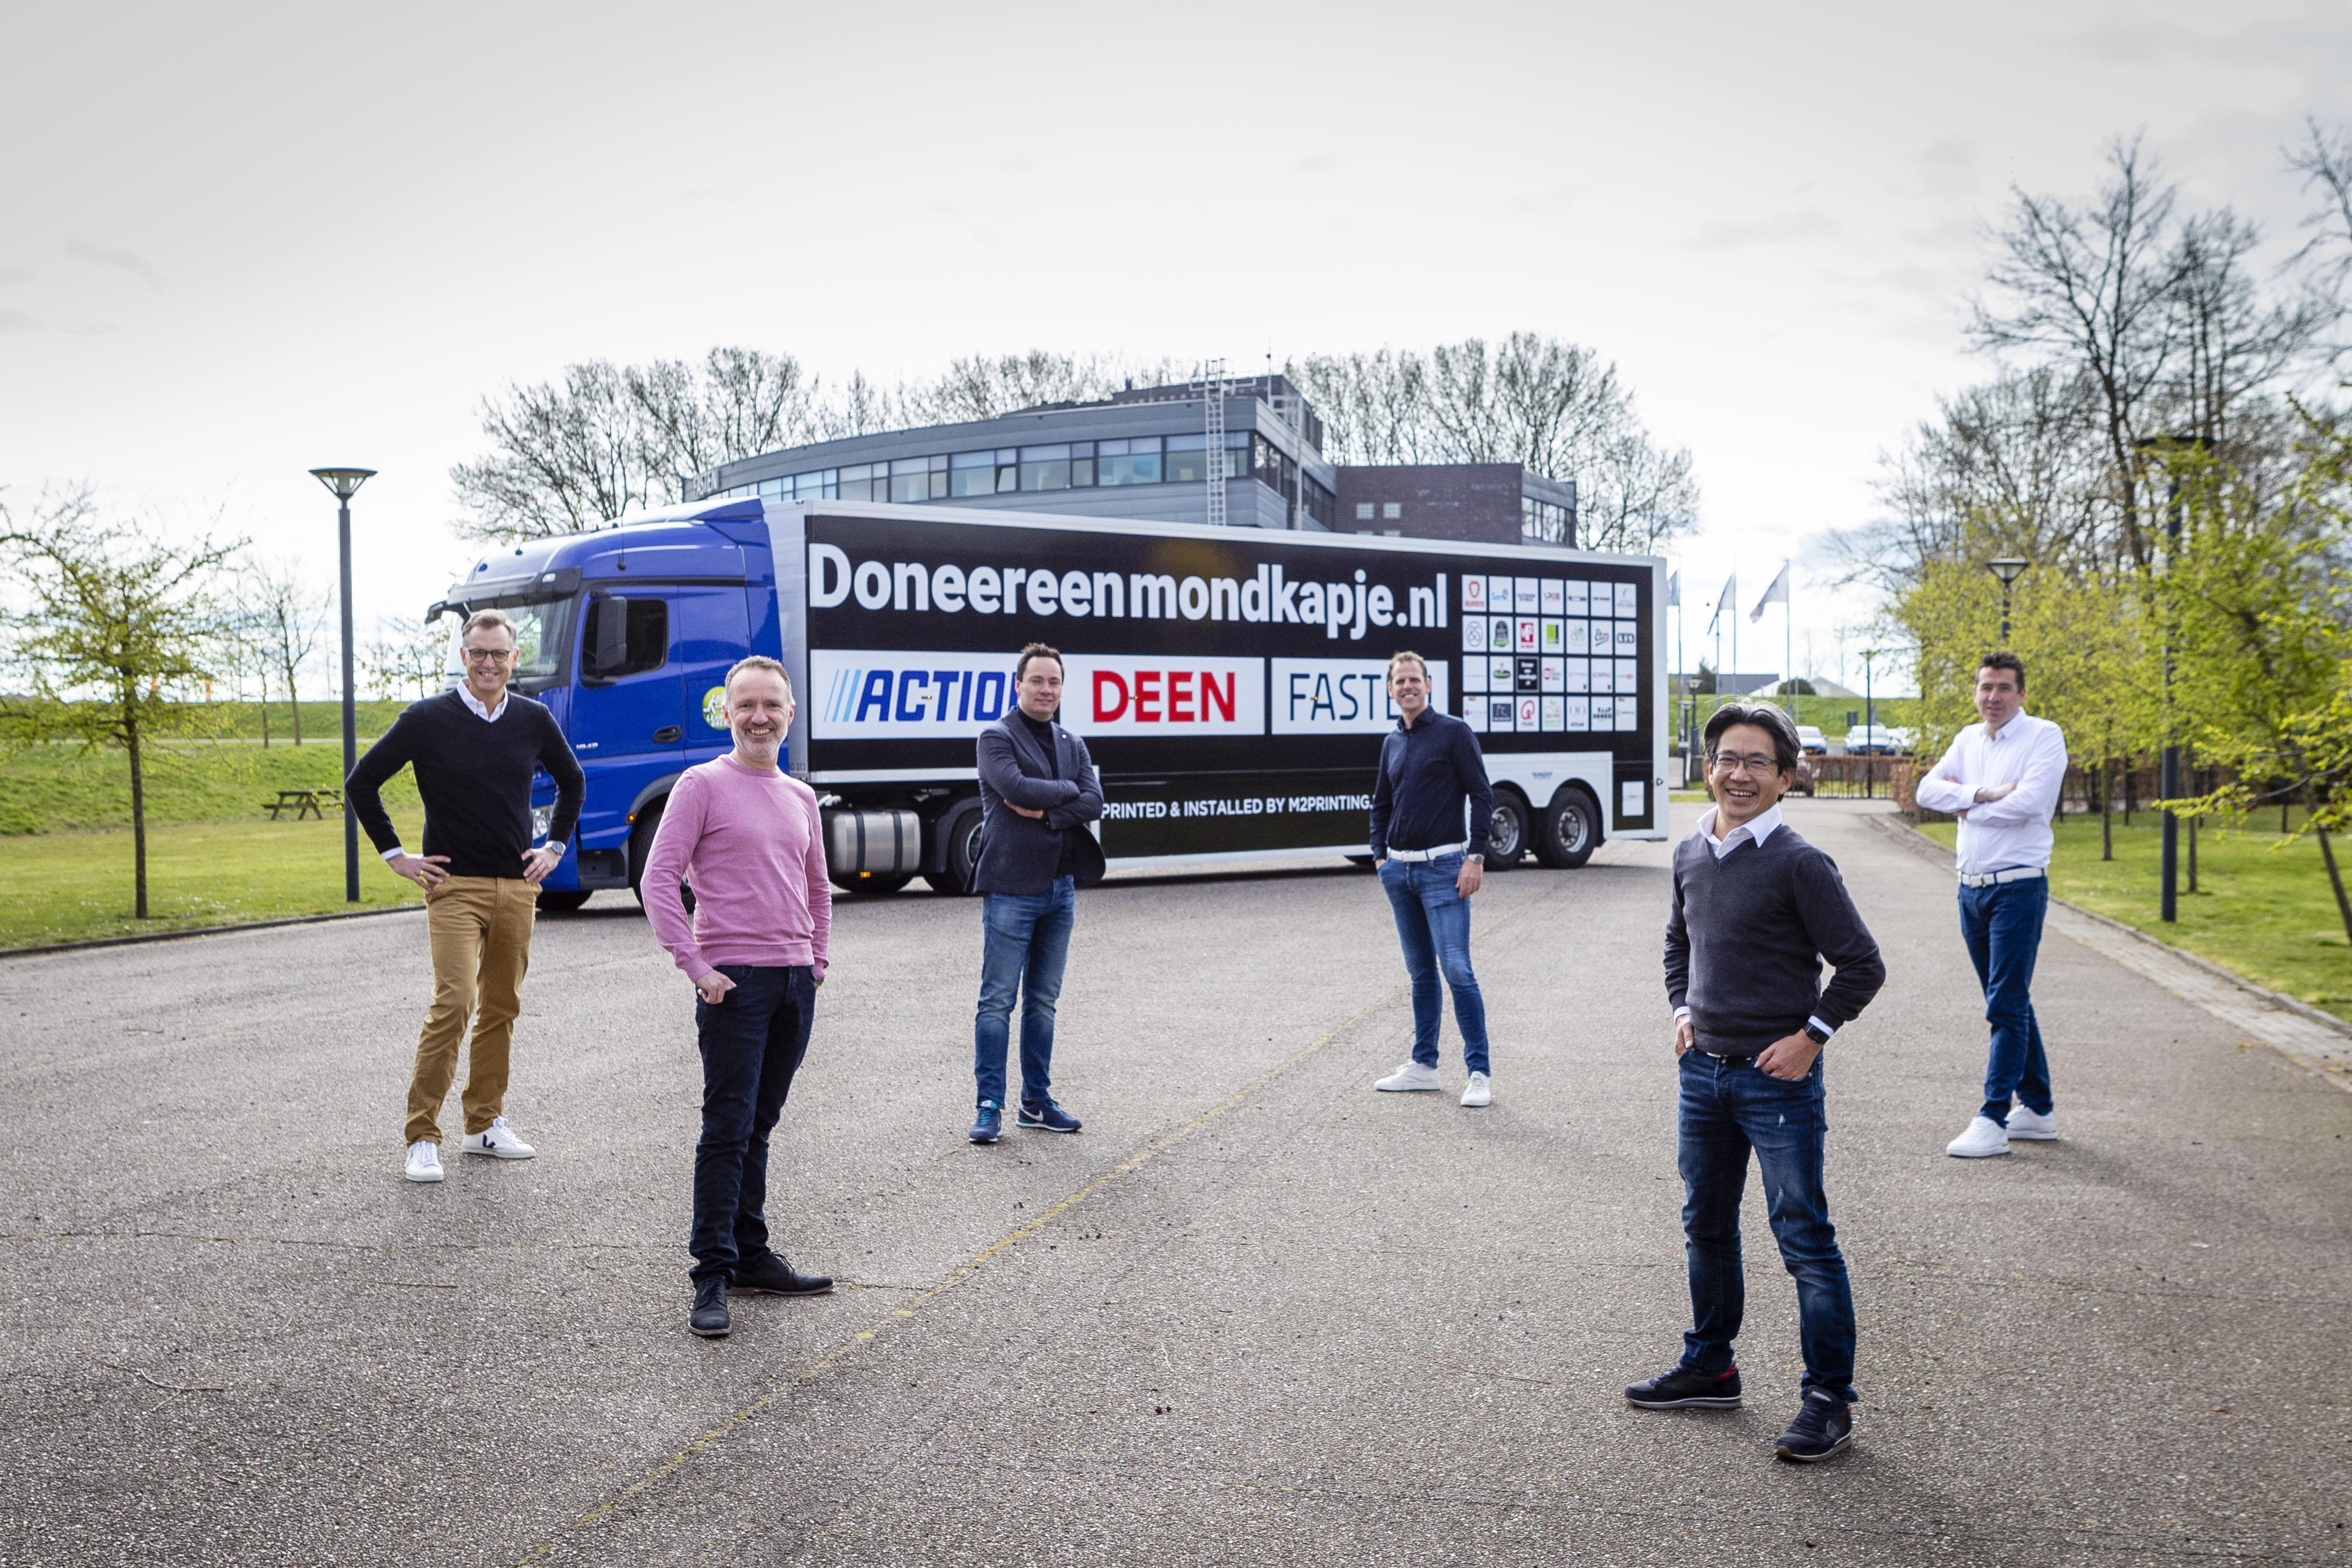 Hoornse ondernemers delen honderdduizend mondkapjes uit